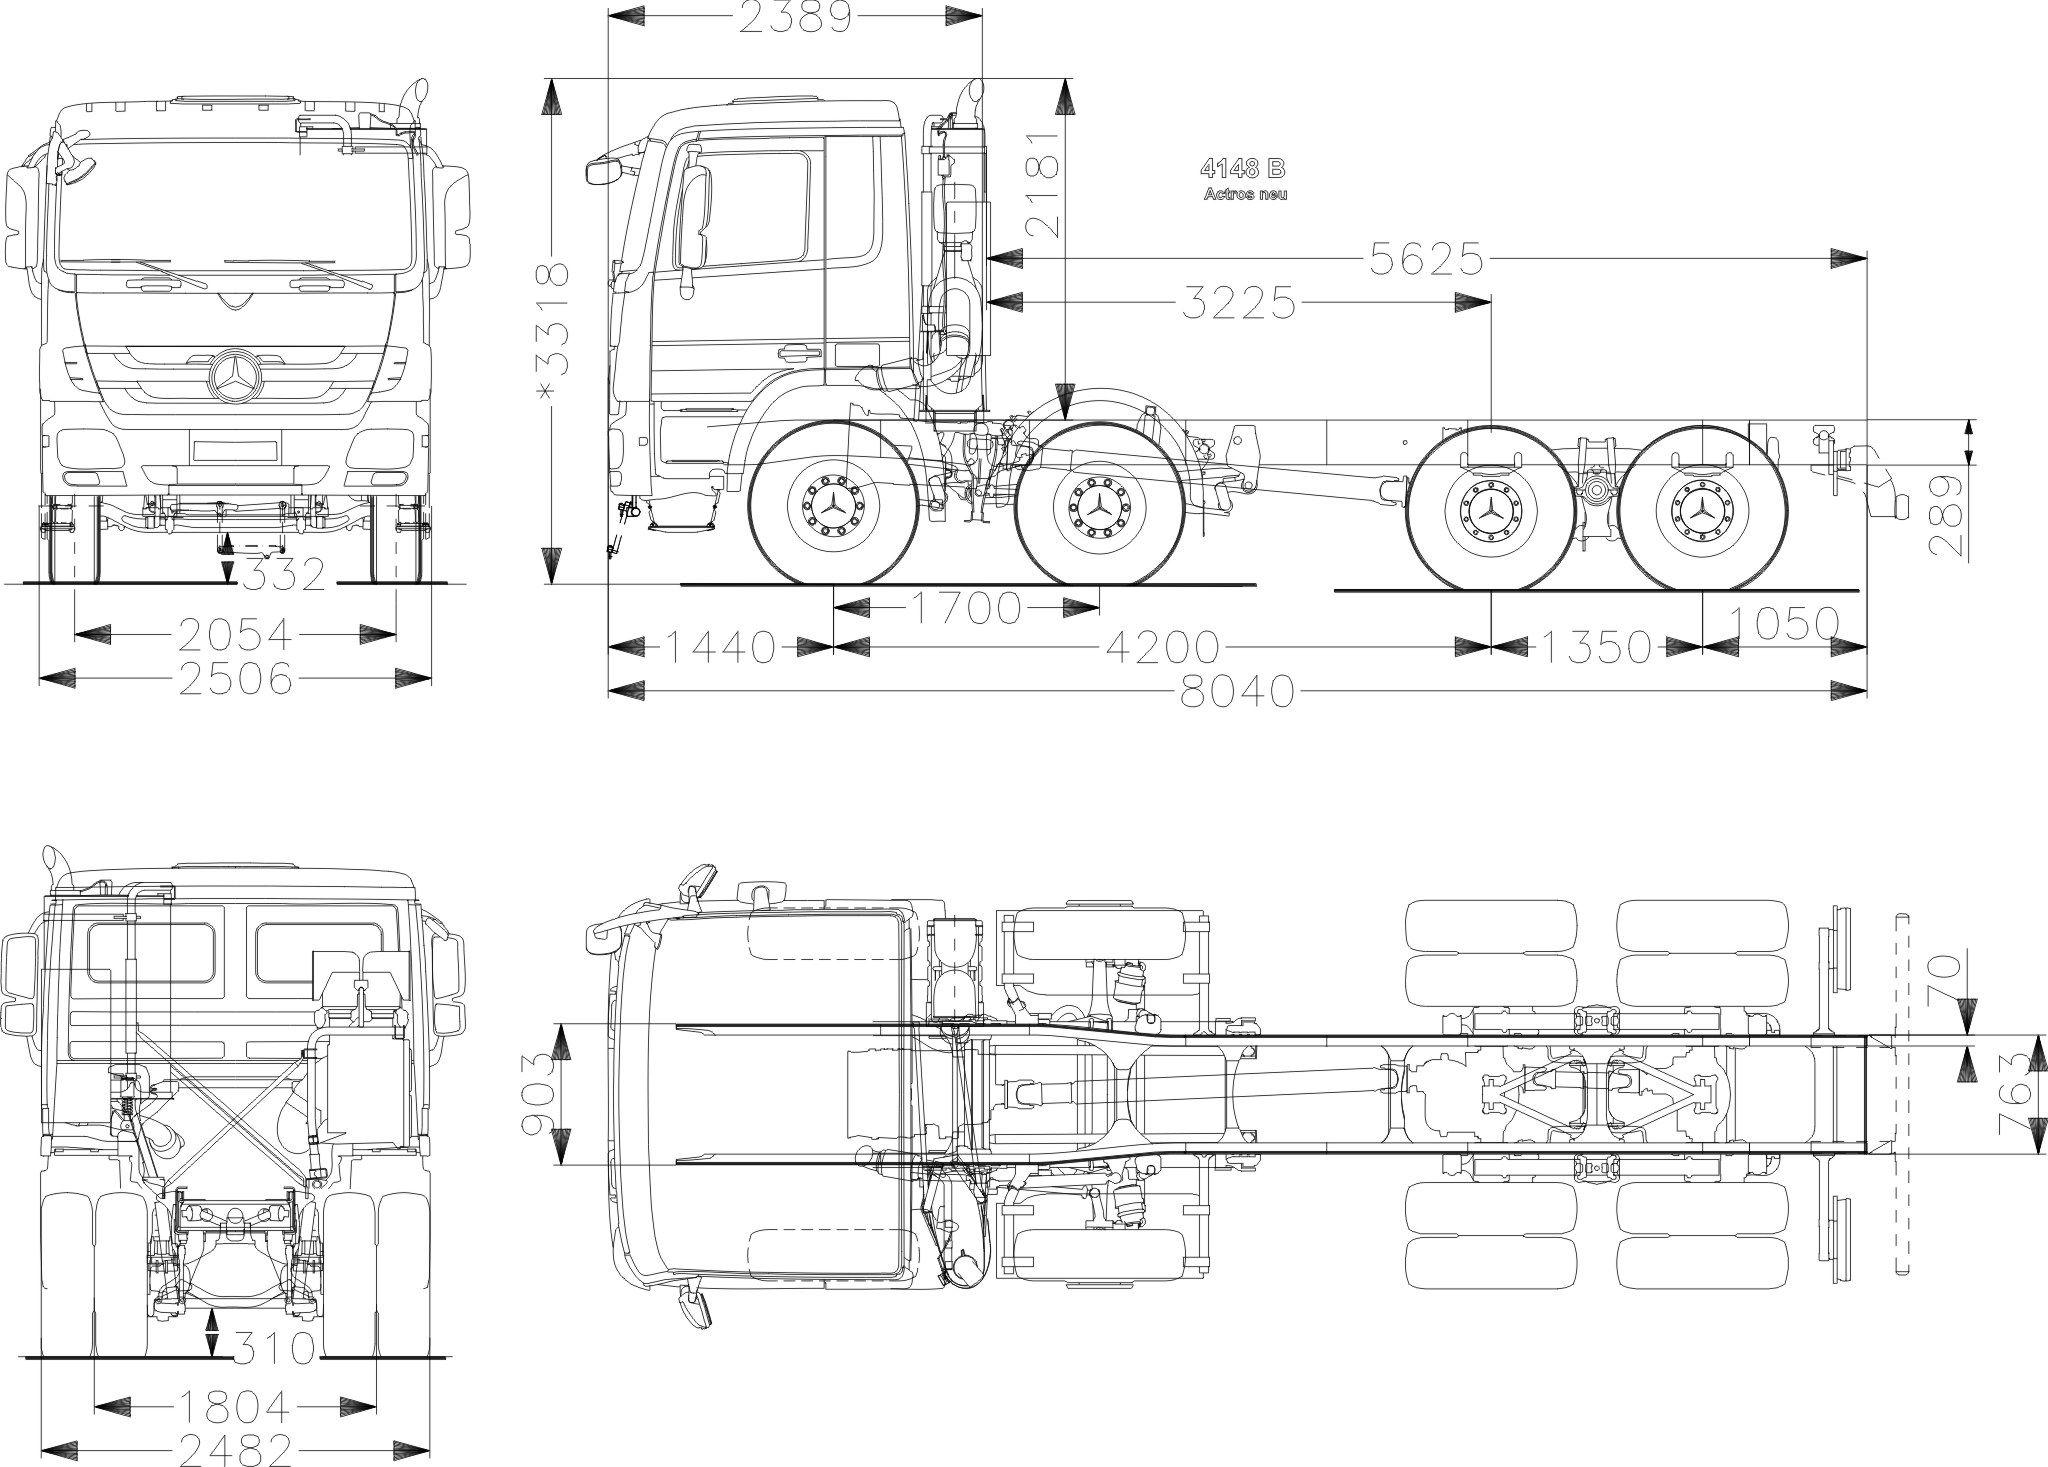 Mercedes Benz Actros 4148 B 8x4 2048 1467